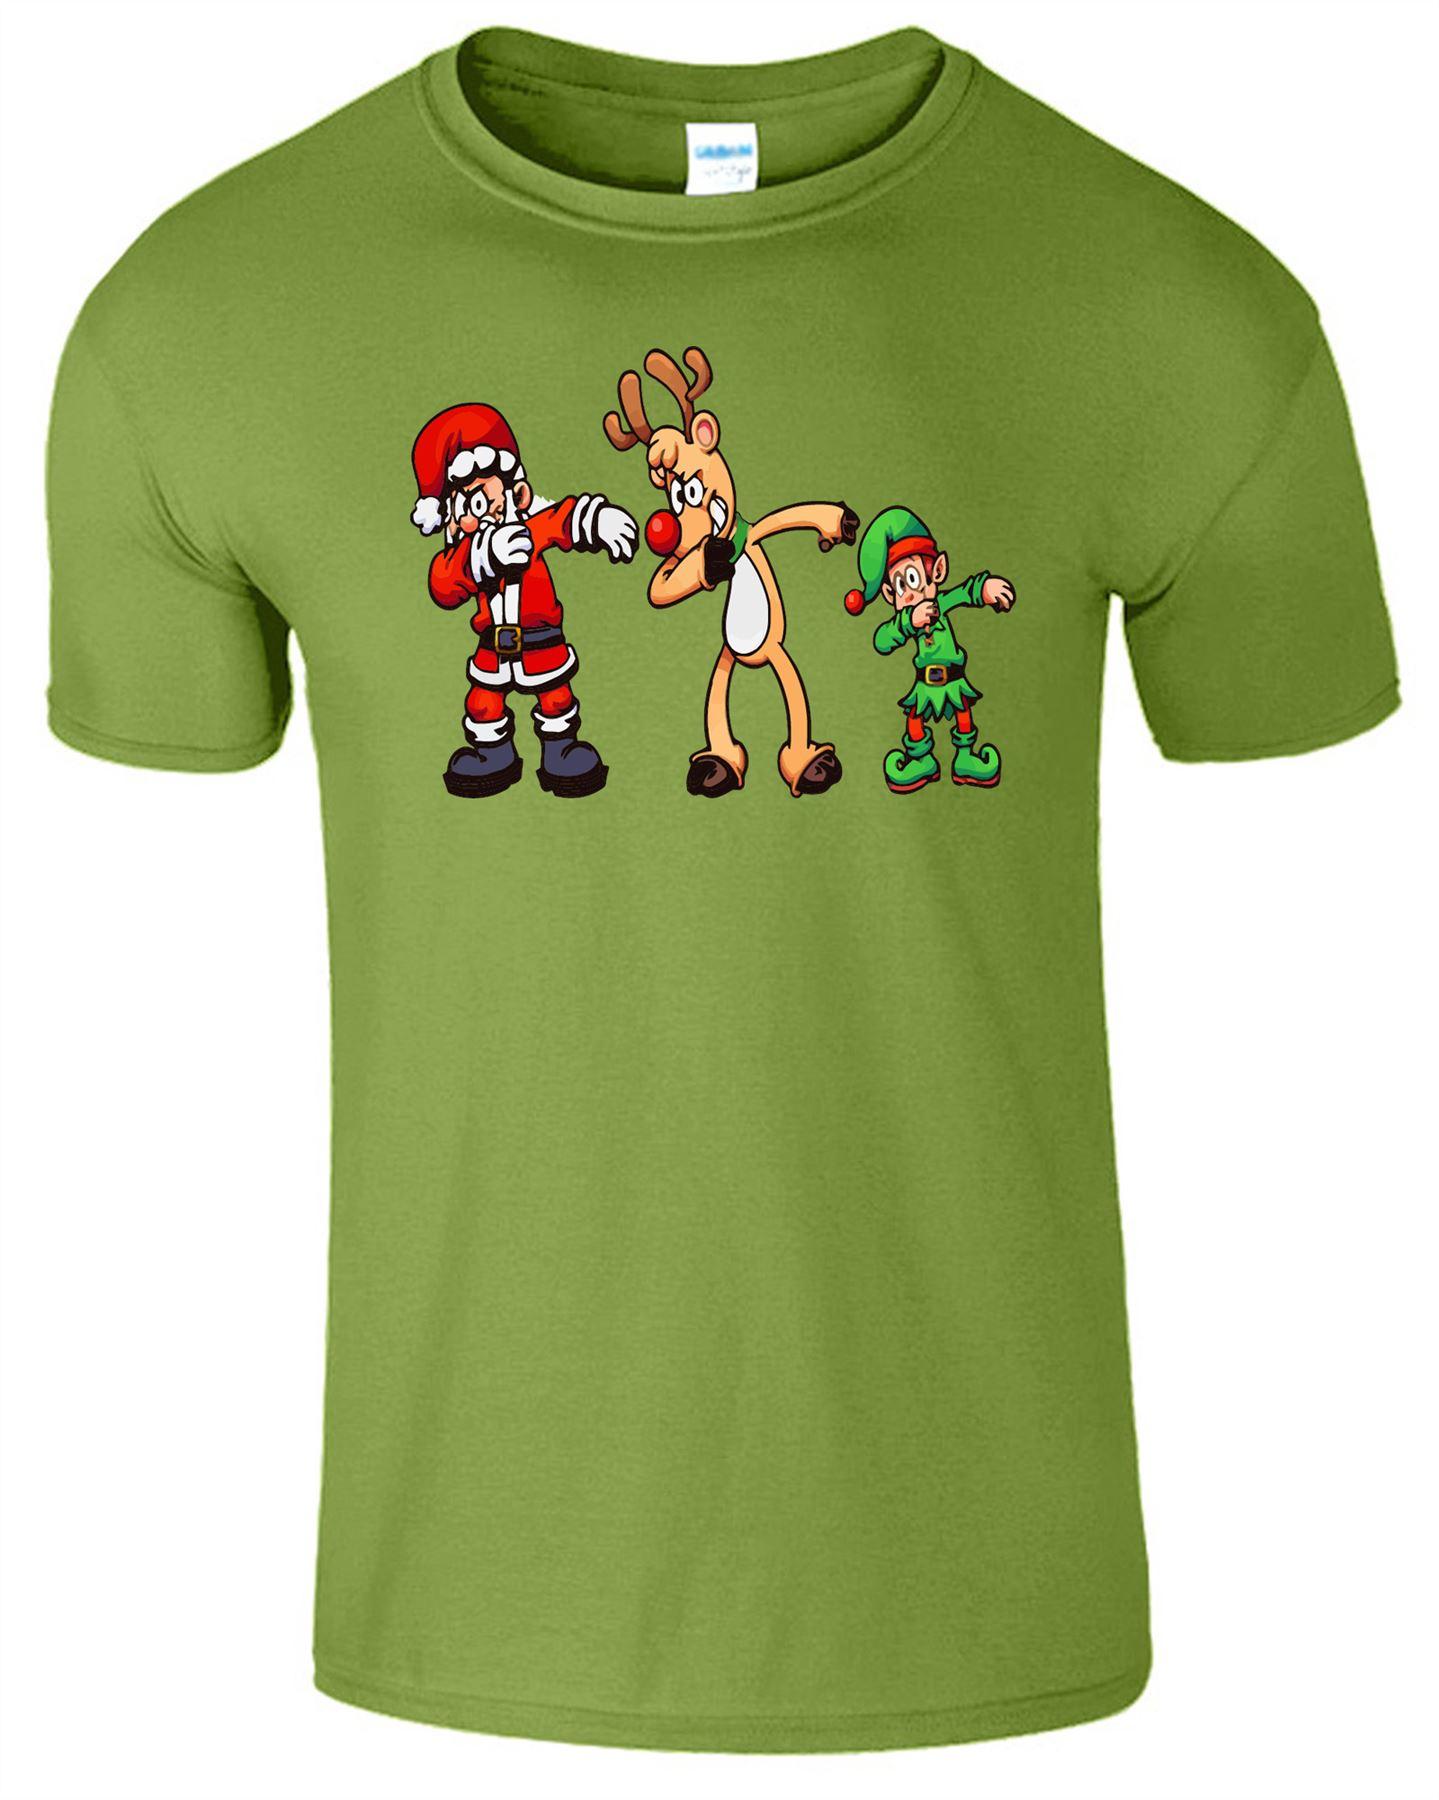 Christmas Reindeer Mens Kids T-Shirt Funny Santa Elf Novelty Xmas Boys T Shirt